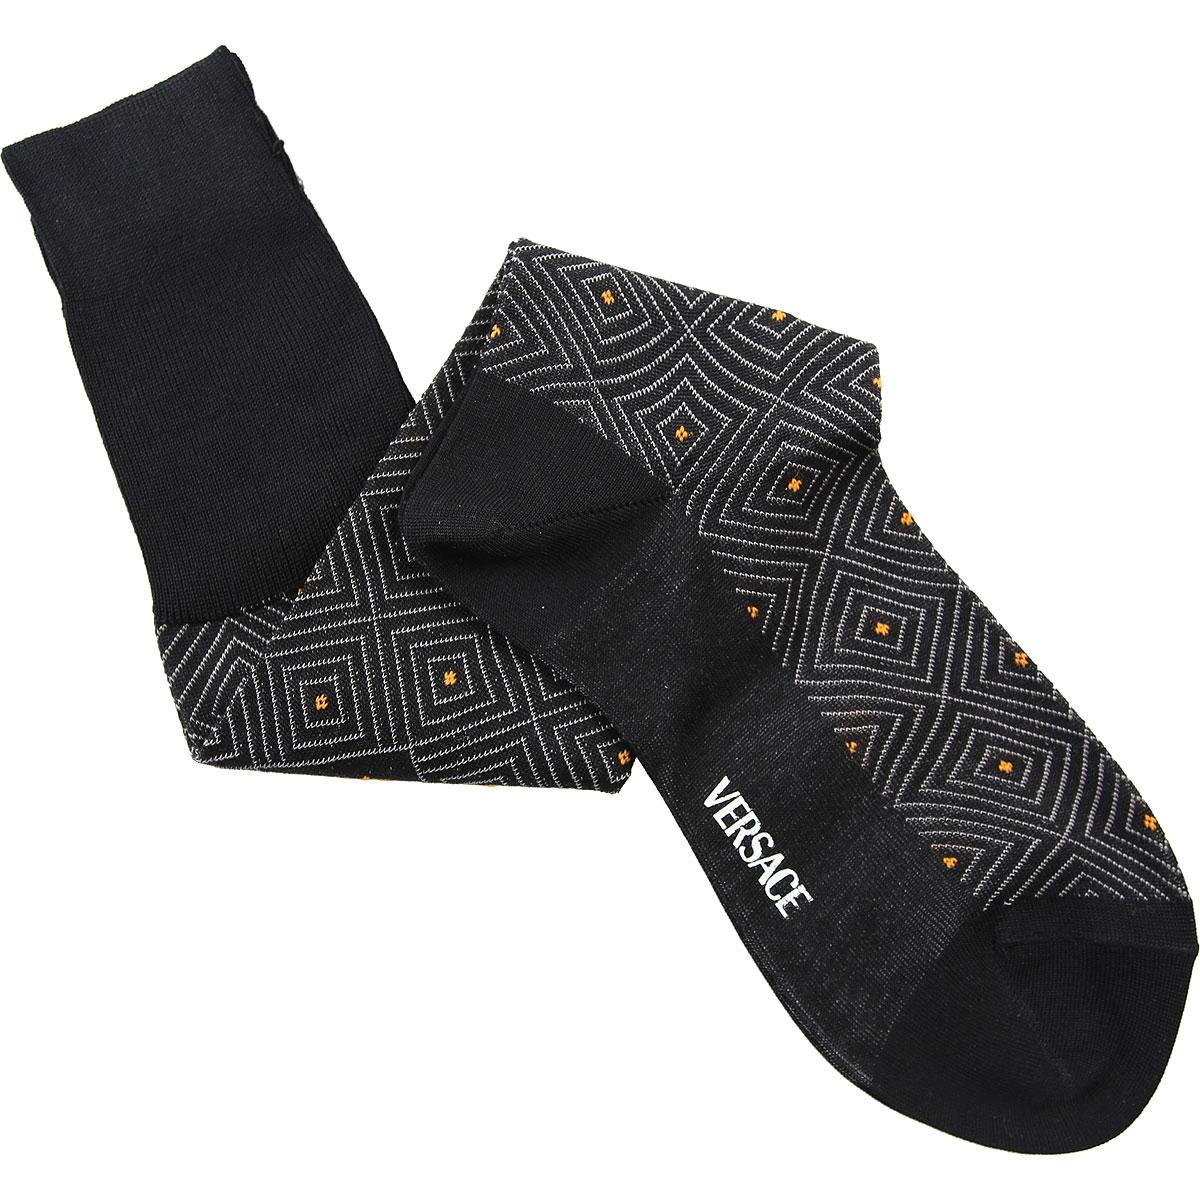 Versace Socks Socks for Men On Sale in Outlet, Black, Lisle Cotton Thread, 2019, 10.5 (Shoe Size: EU 42.5 - US 8.5) 10 (Shoe Size: EU 42 - US 8) 12.5